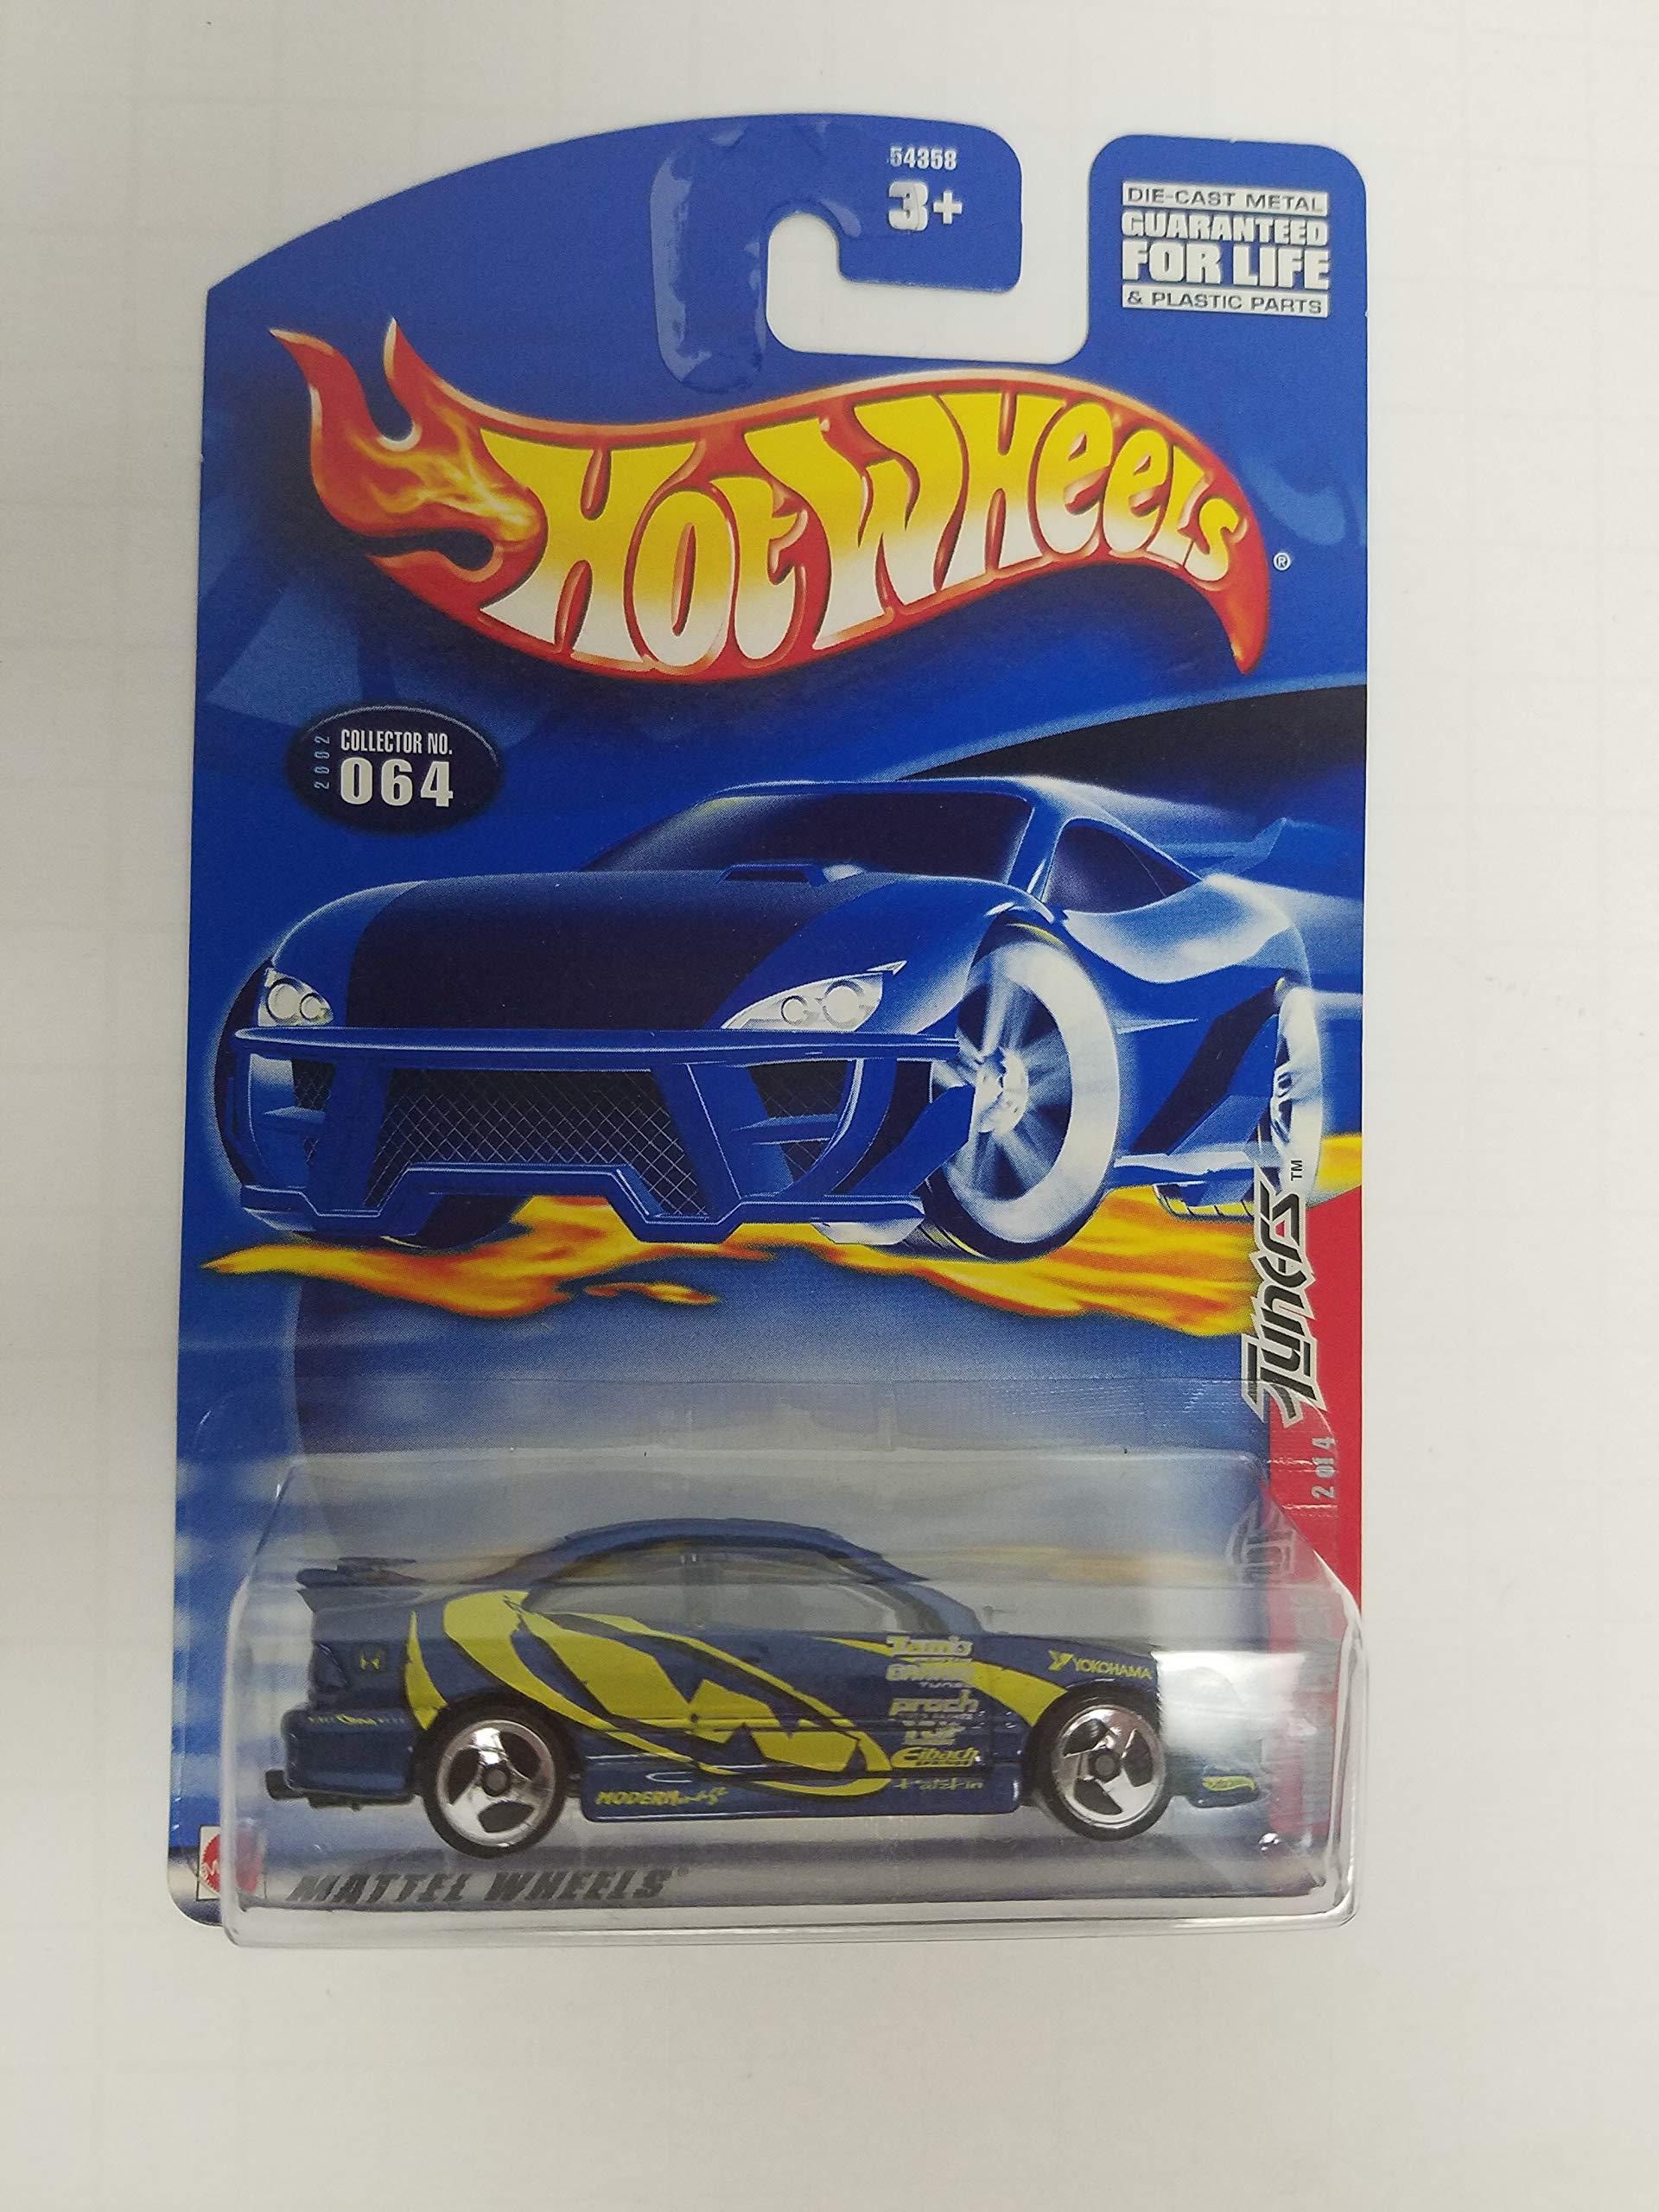 Honda Civic Hot Wheels 2002 diecast 1/64 scale car No. 064